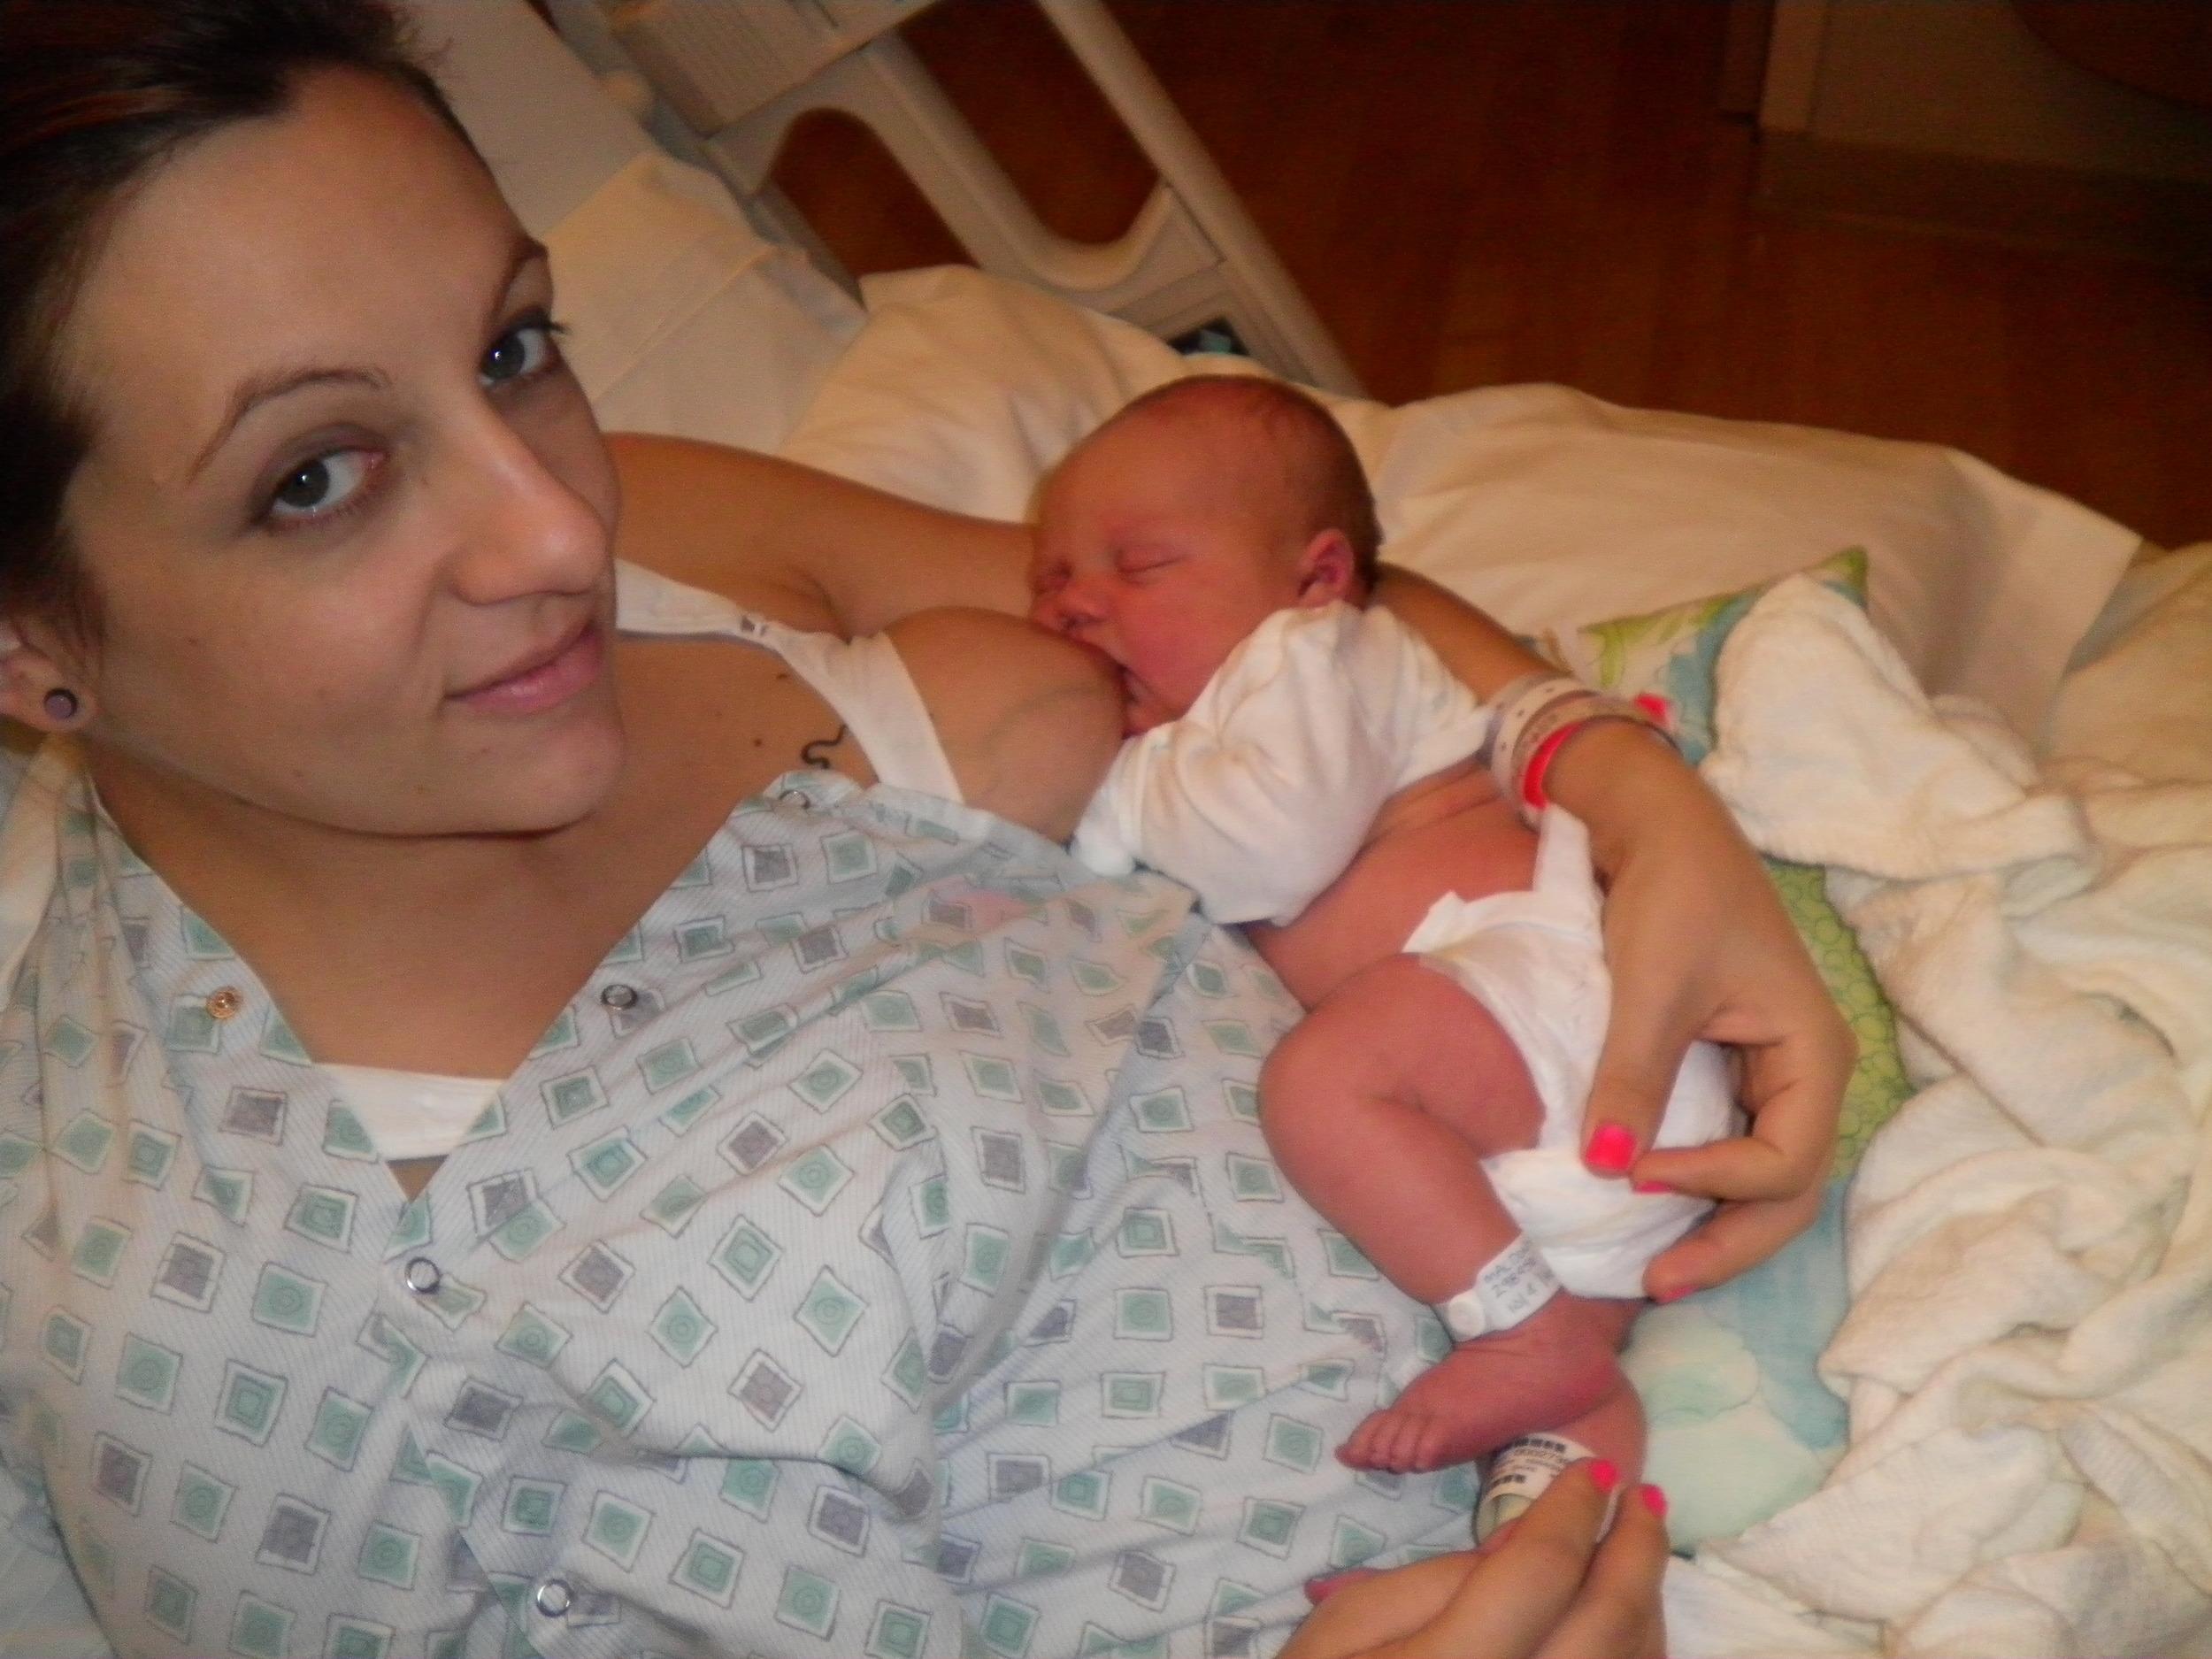 first time breastfeeding newborn - my story as a birth photographer oahu hawaii birth and family documentary photographer